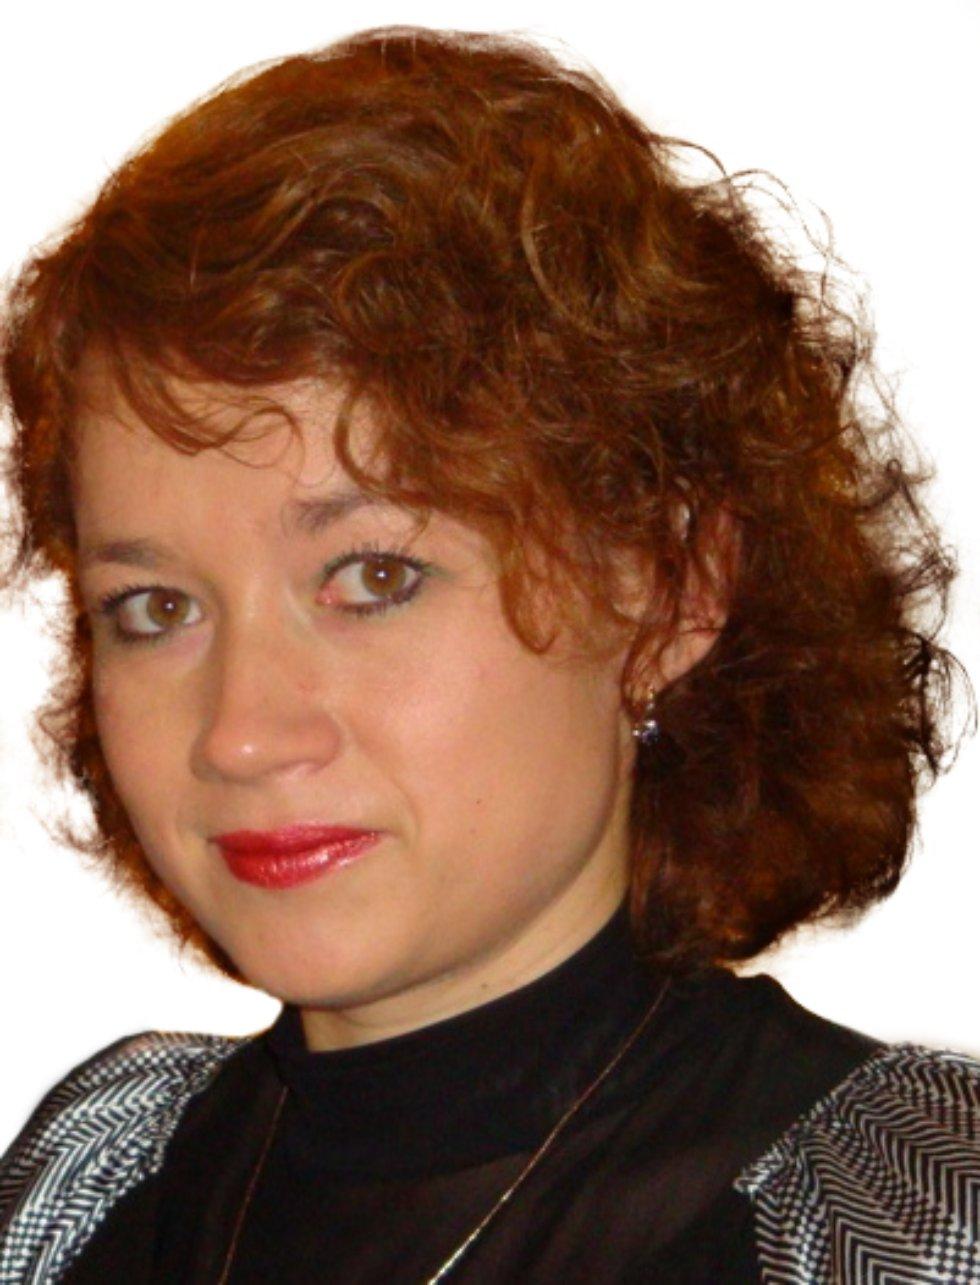 Мингазова Юлия Георгиевна